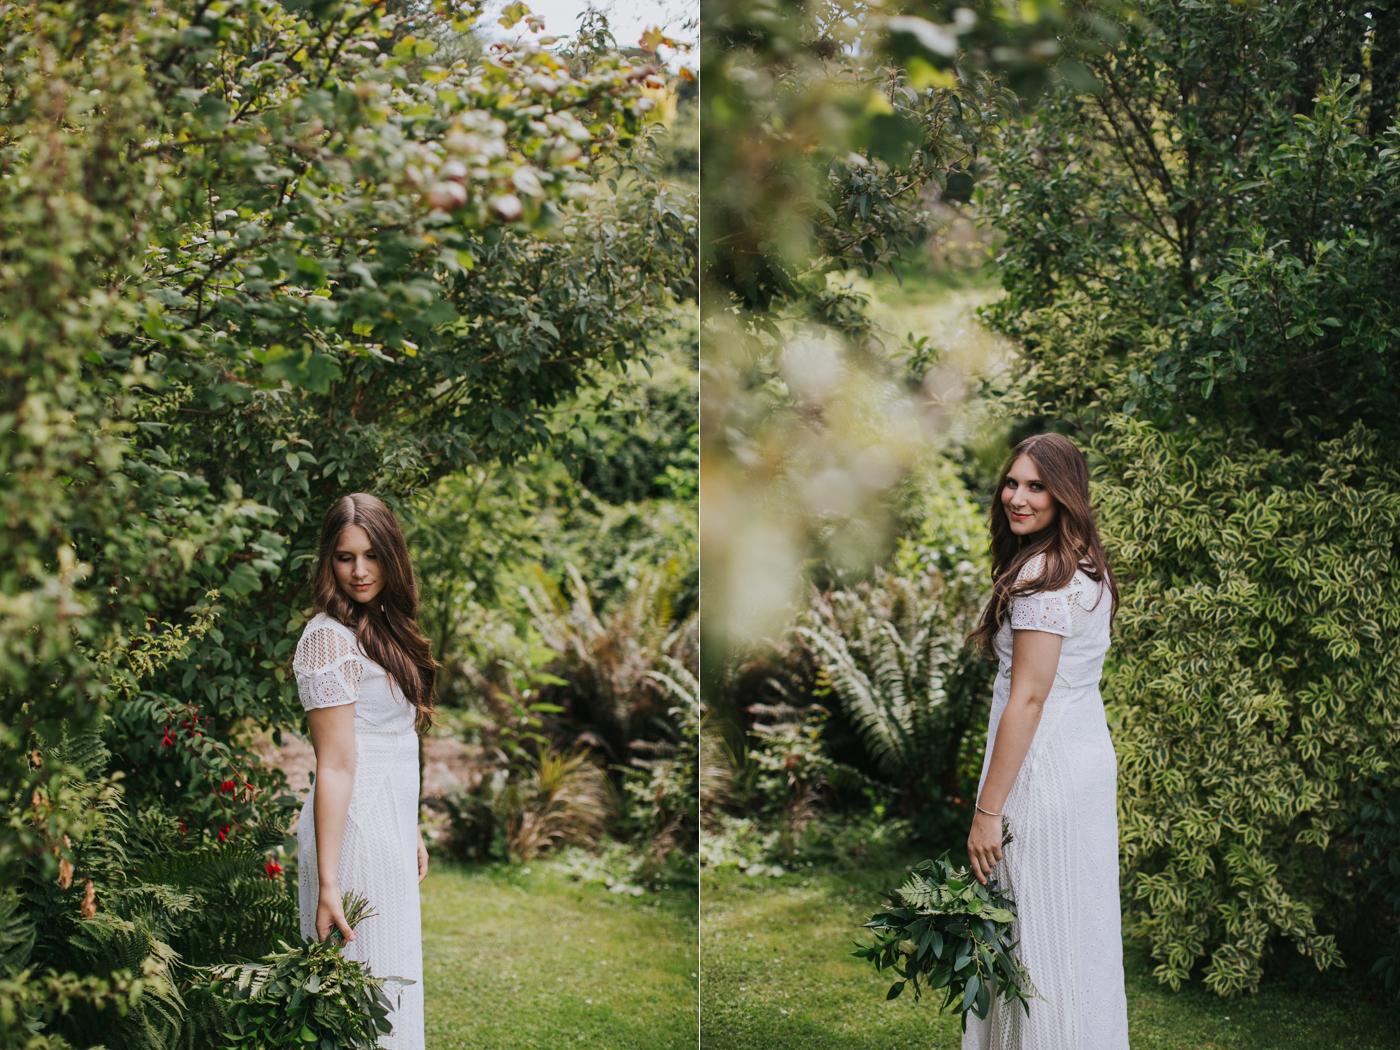 Ariana & Tim - Dunedin, New Zealand Wedding - Destination Wedding - Samantha Heather Photography-61.jpg